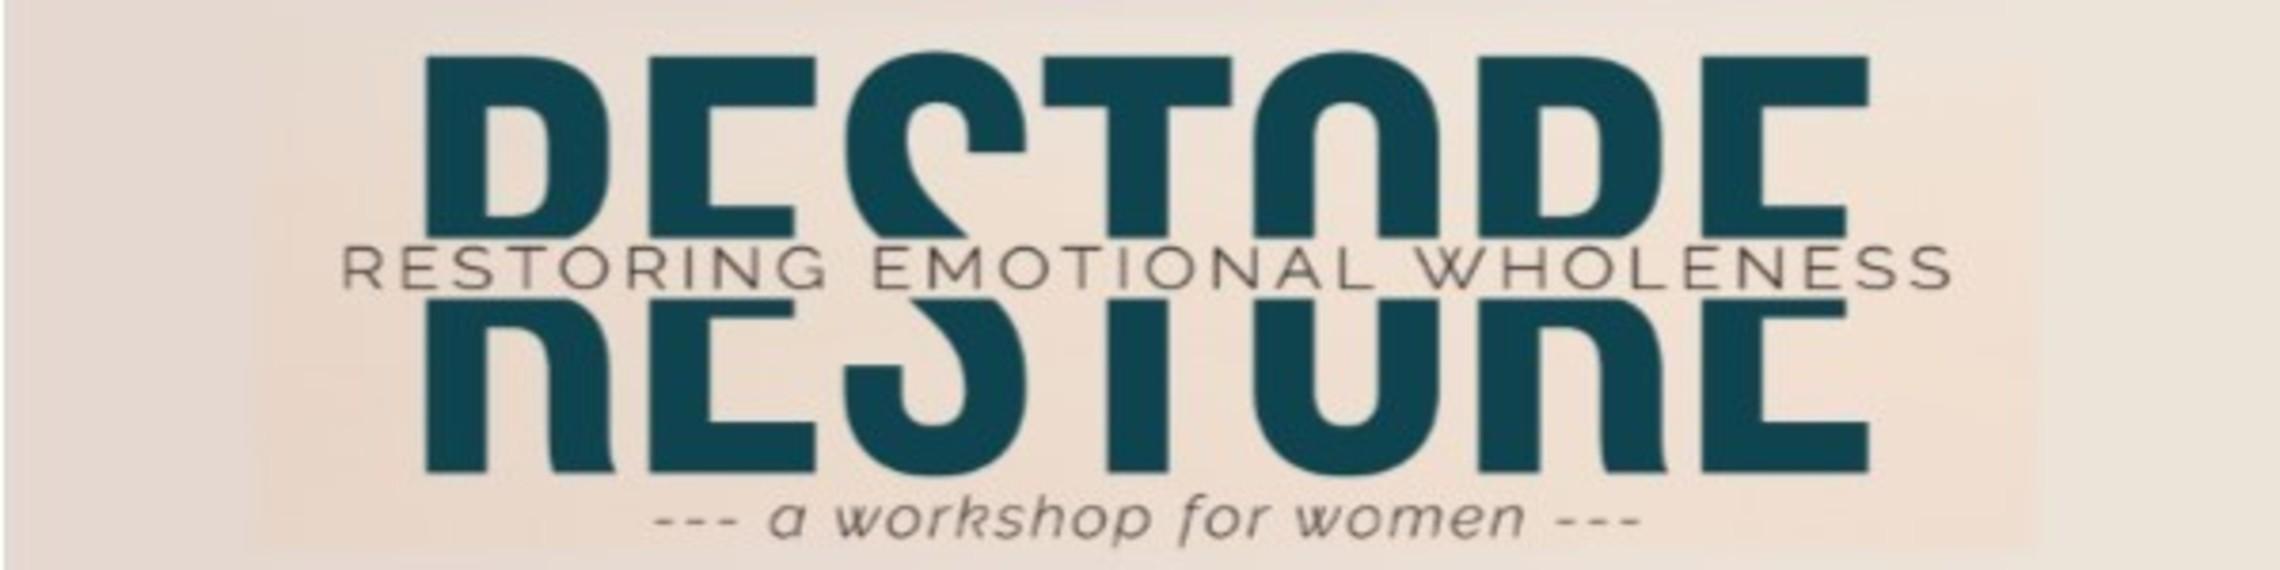 Restore Emotional Wholeness